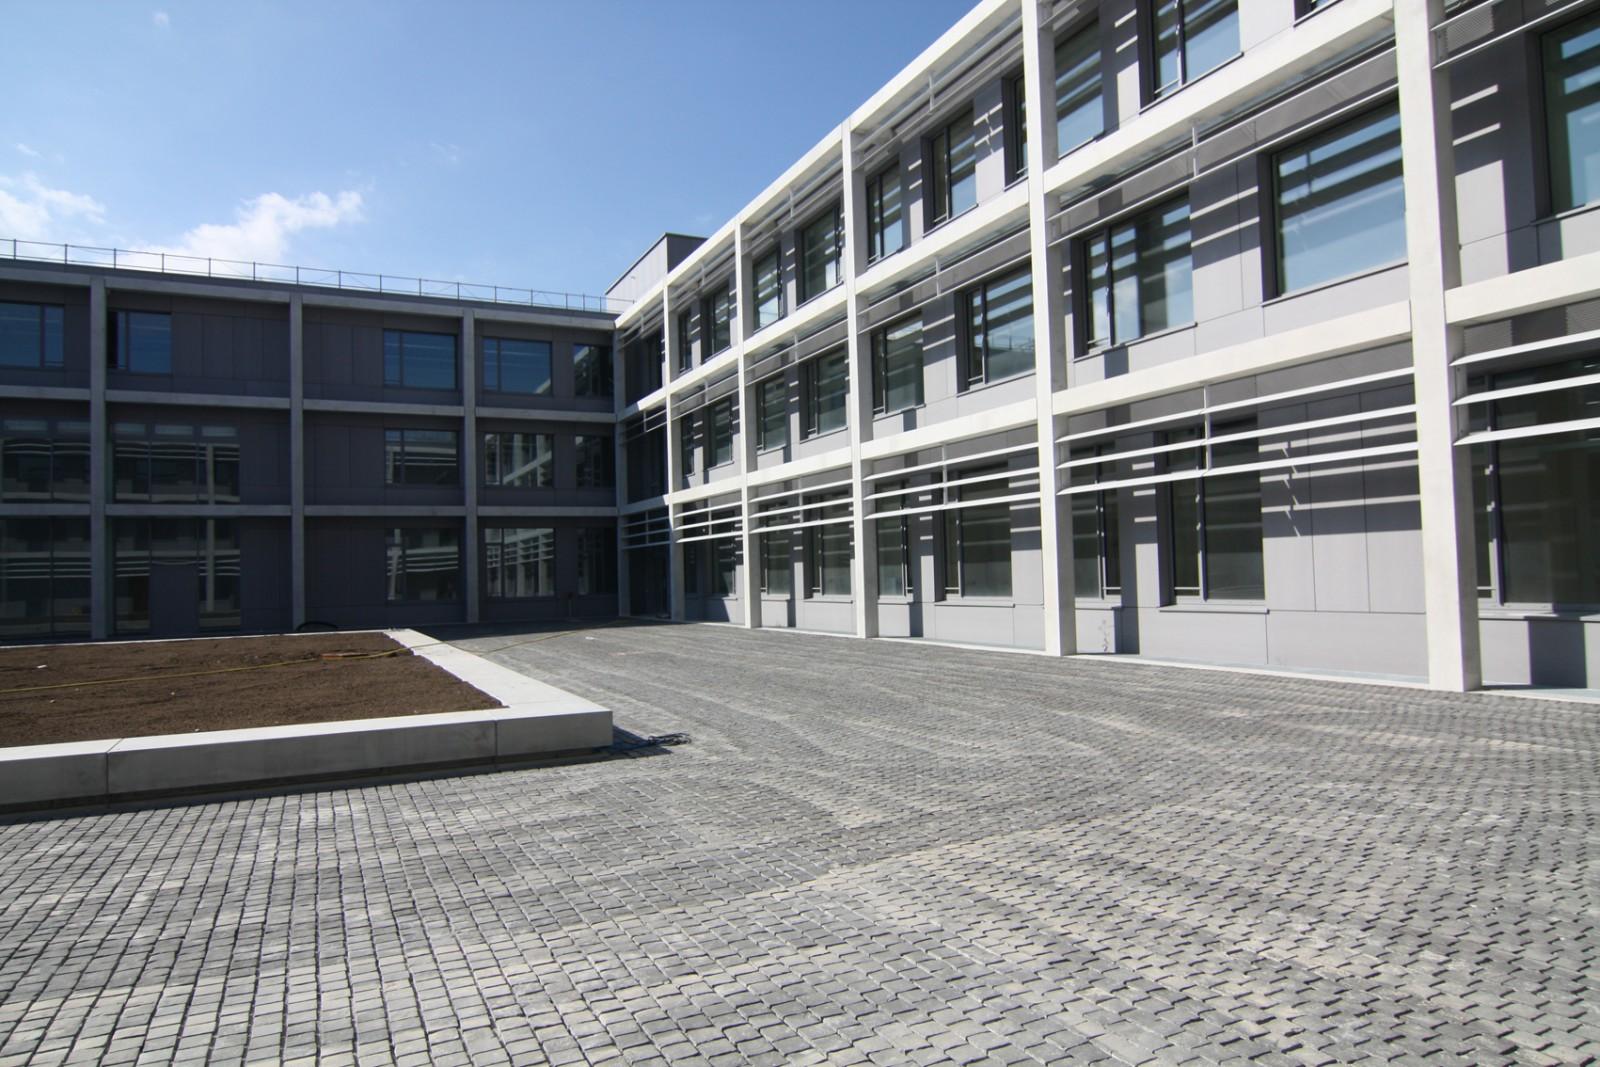 Neubau Lehrsaal- und Funktionsgebäude, Pöcking